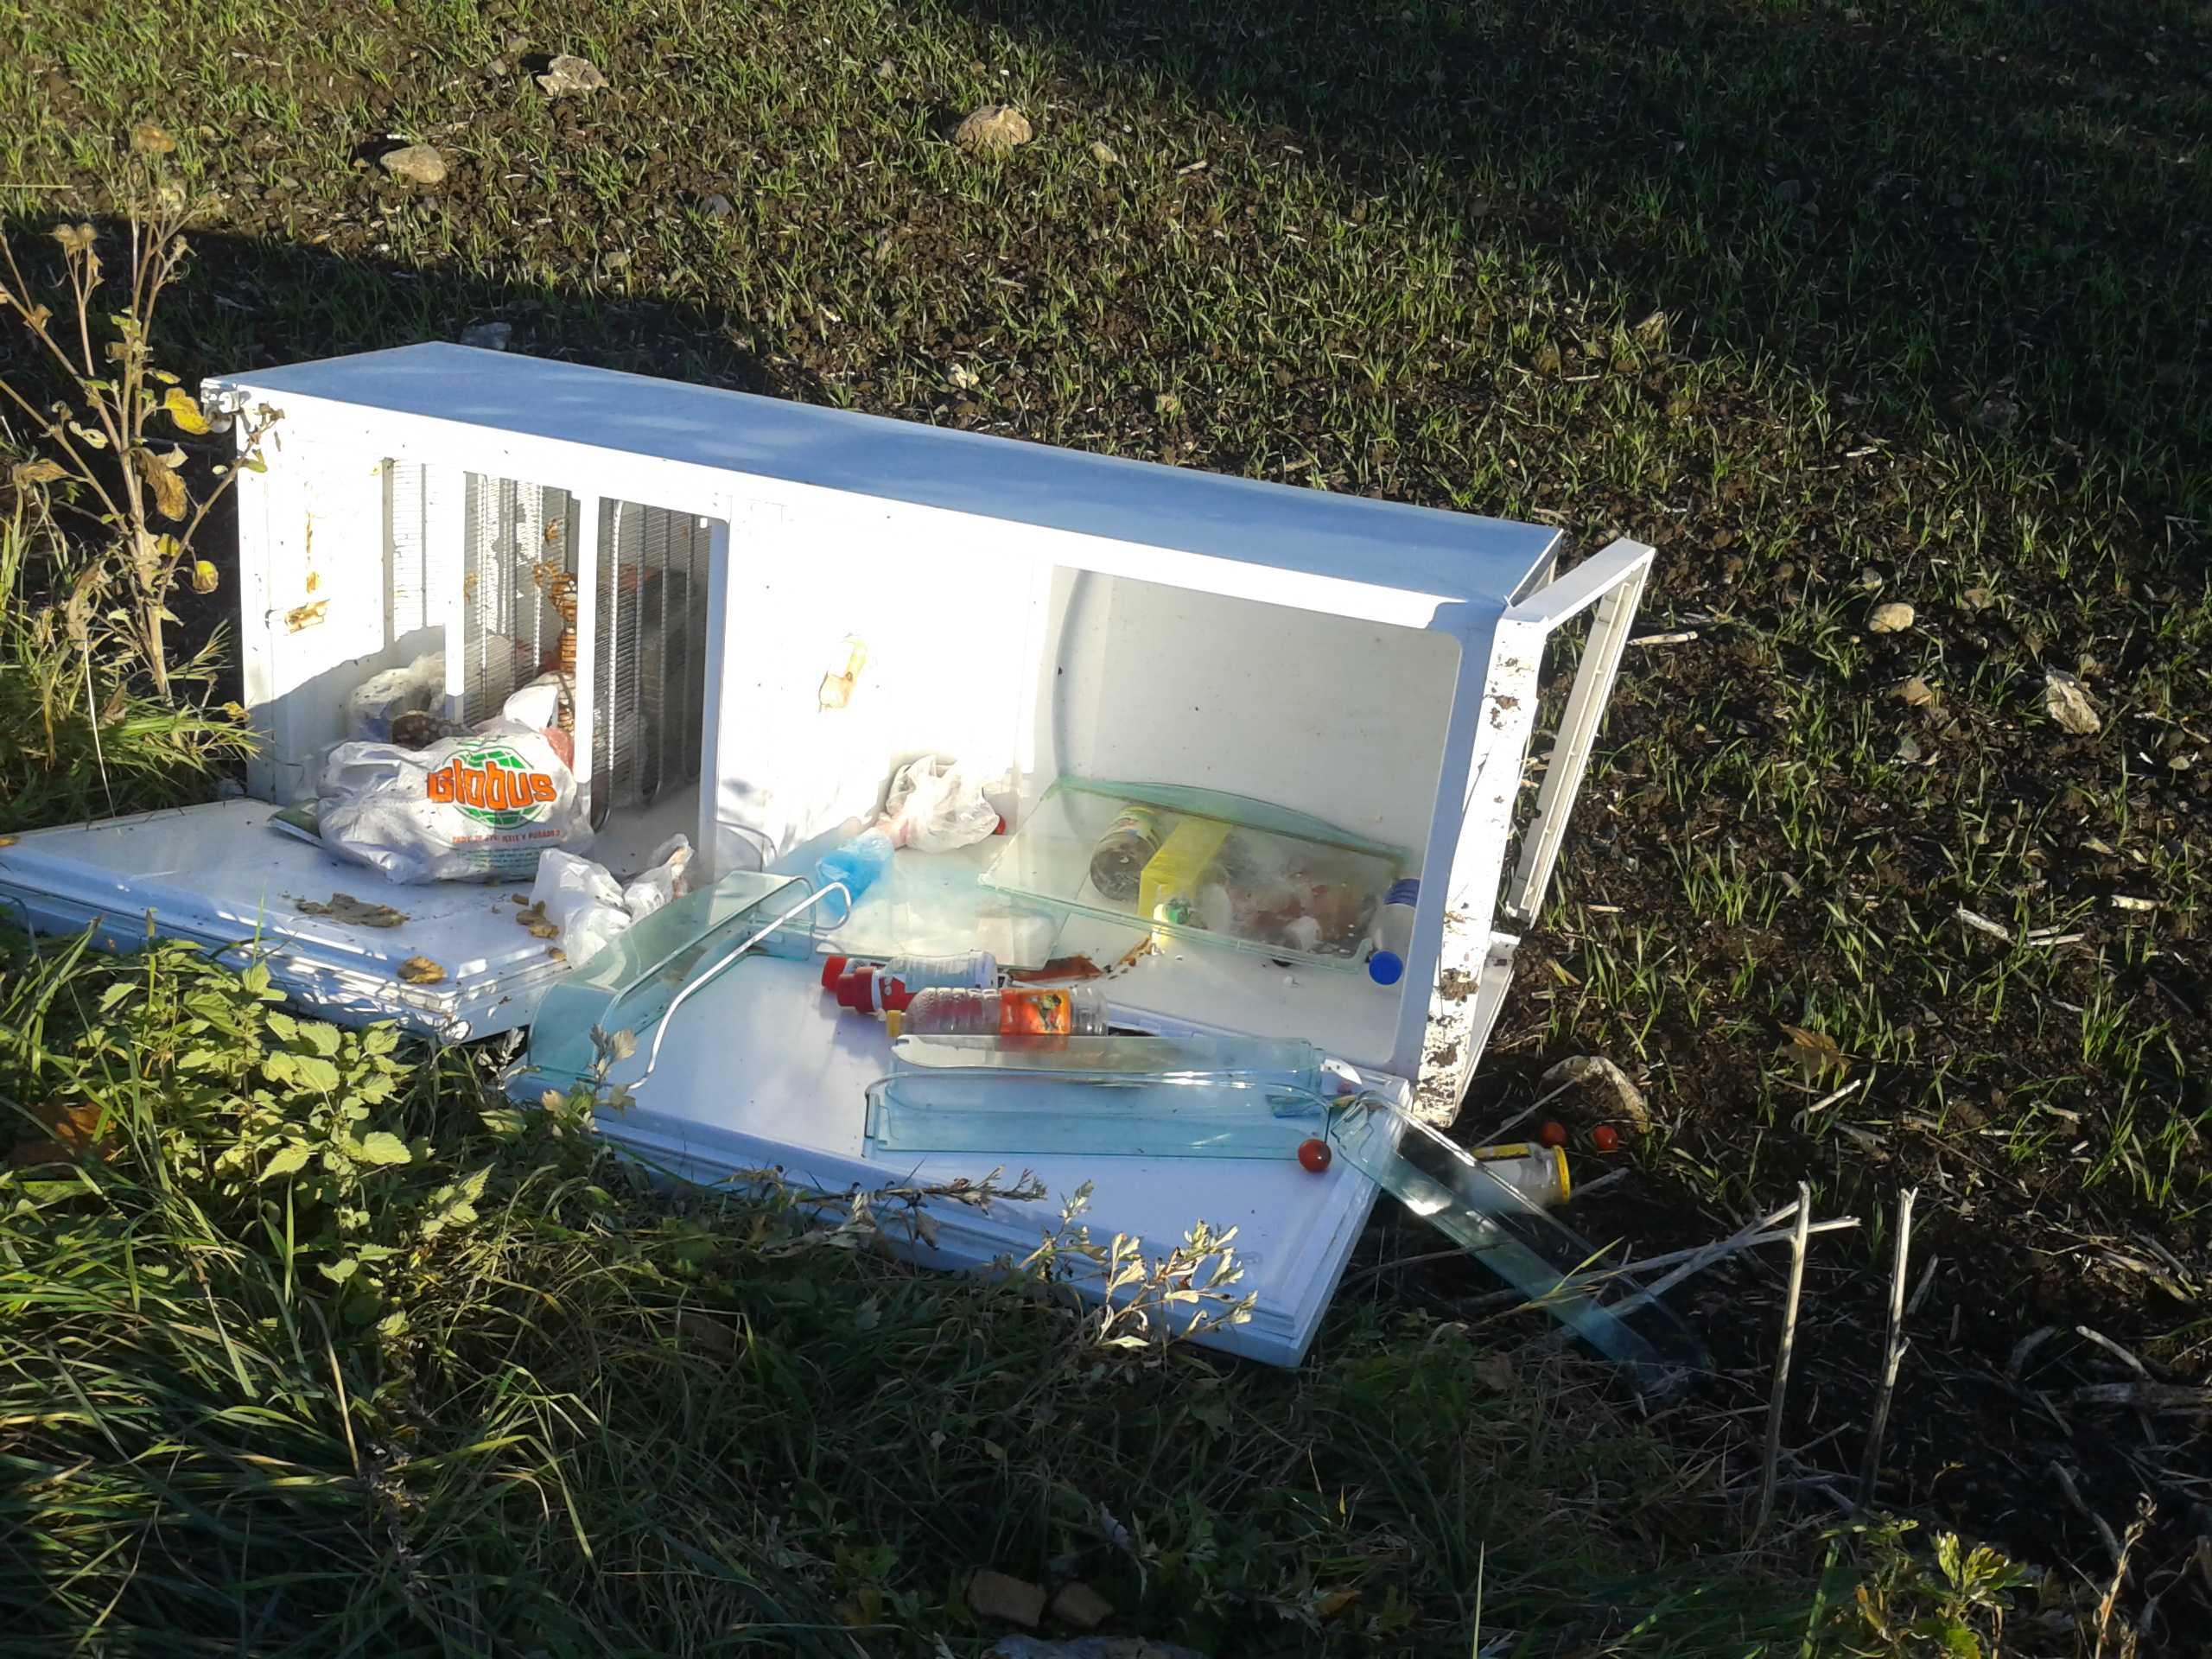 lednice skladka 10 2013 3